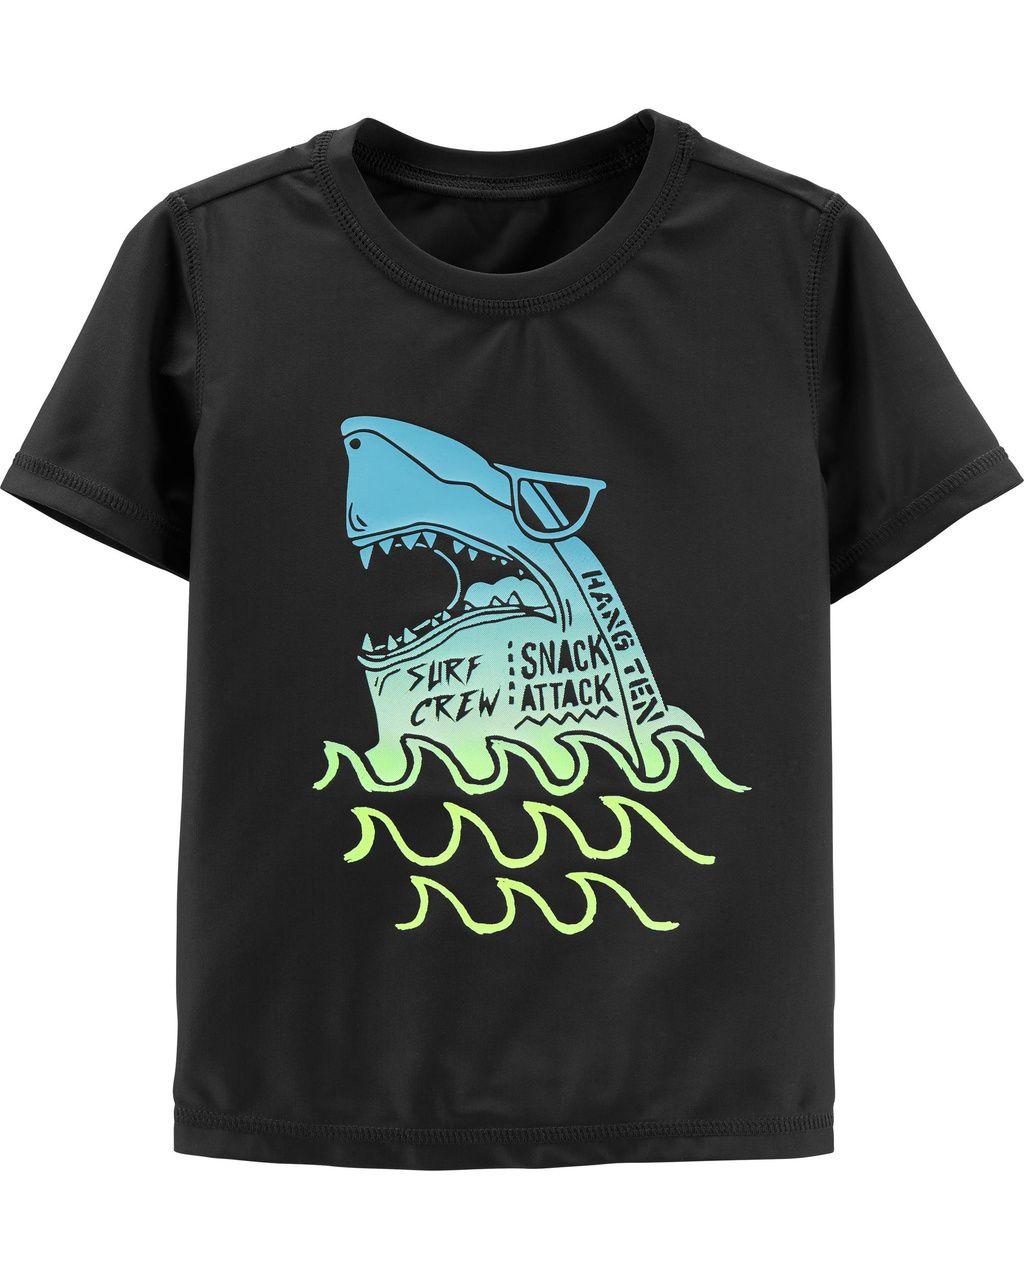 Camiseta Praia Oshkosh Surf Crew